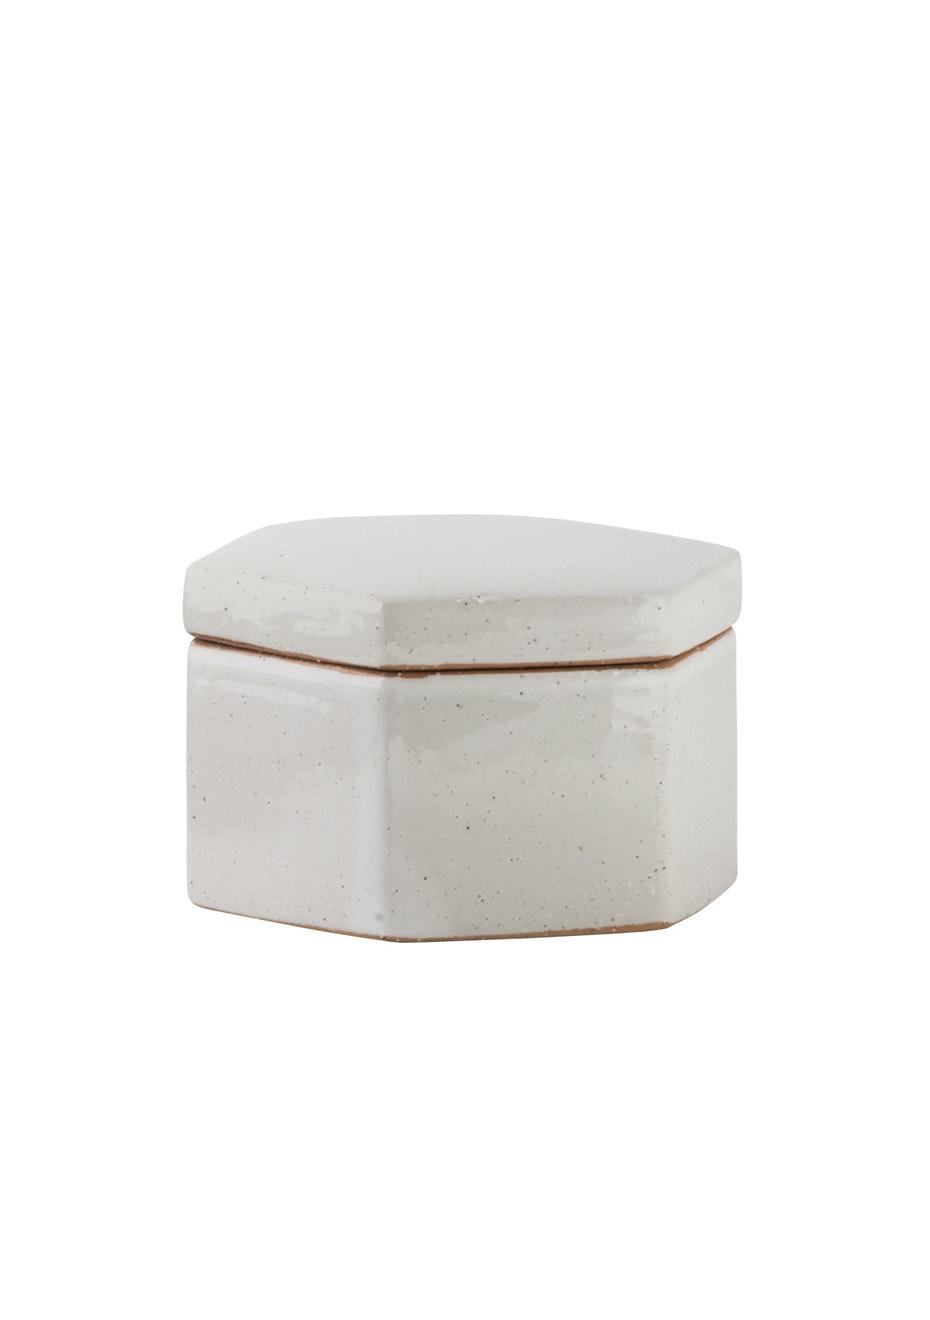 General Eclectic - Aurora Hex Box Small Stone